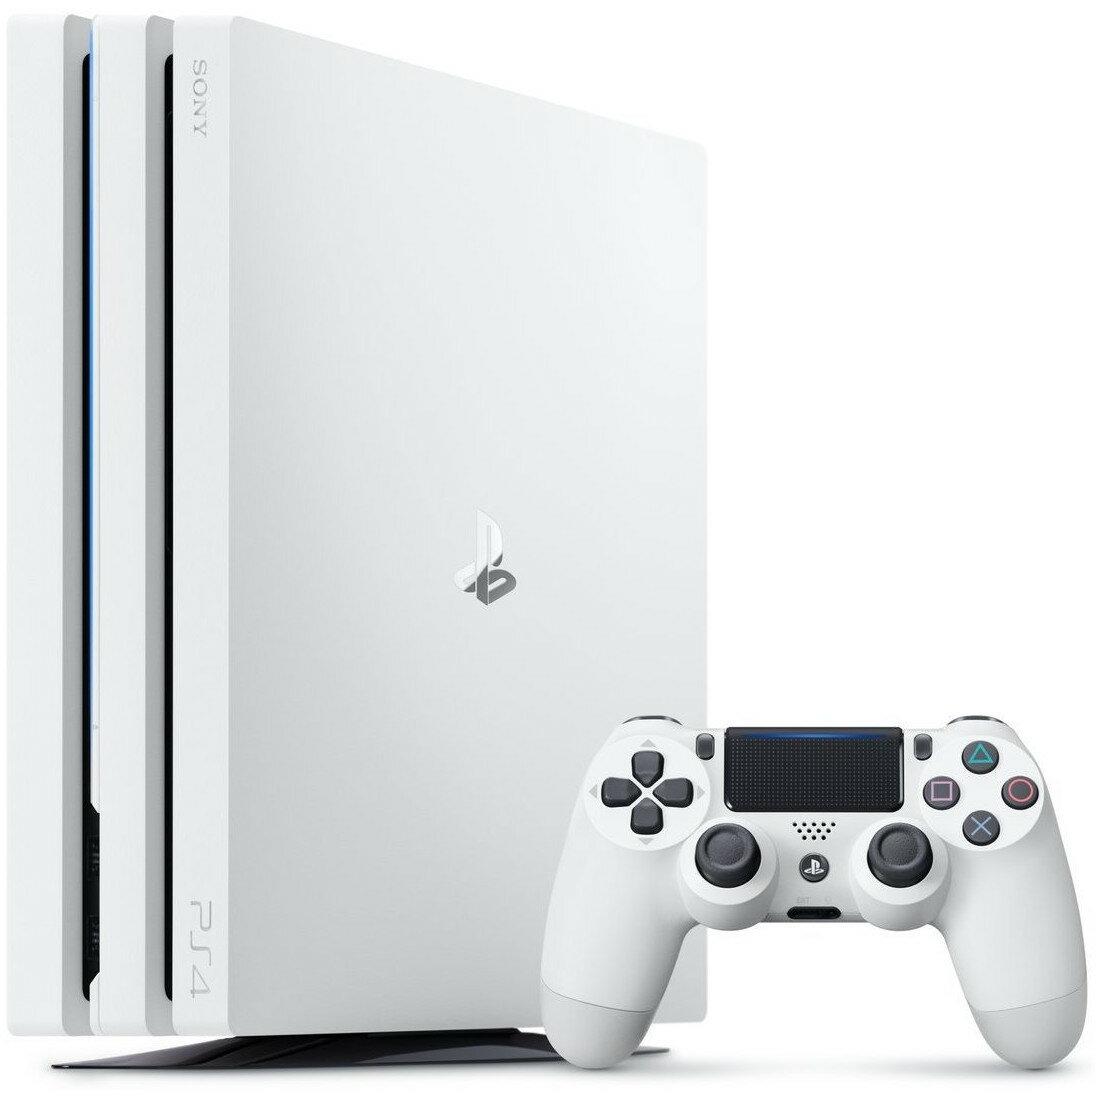 Sony PlayStation 4 Pro 1TB Destiny 2 Bundle Limited Edition Console White 0